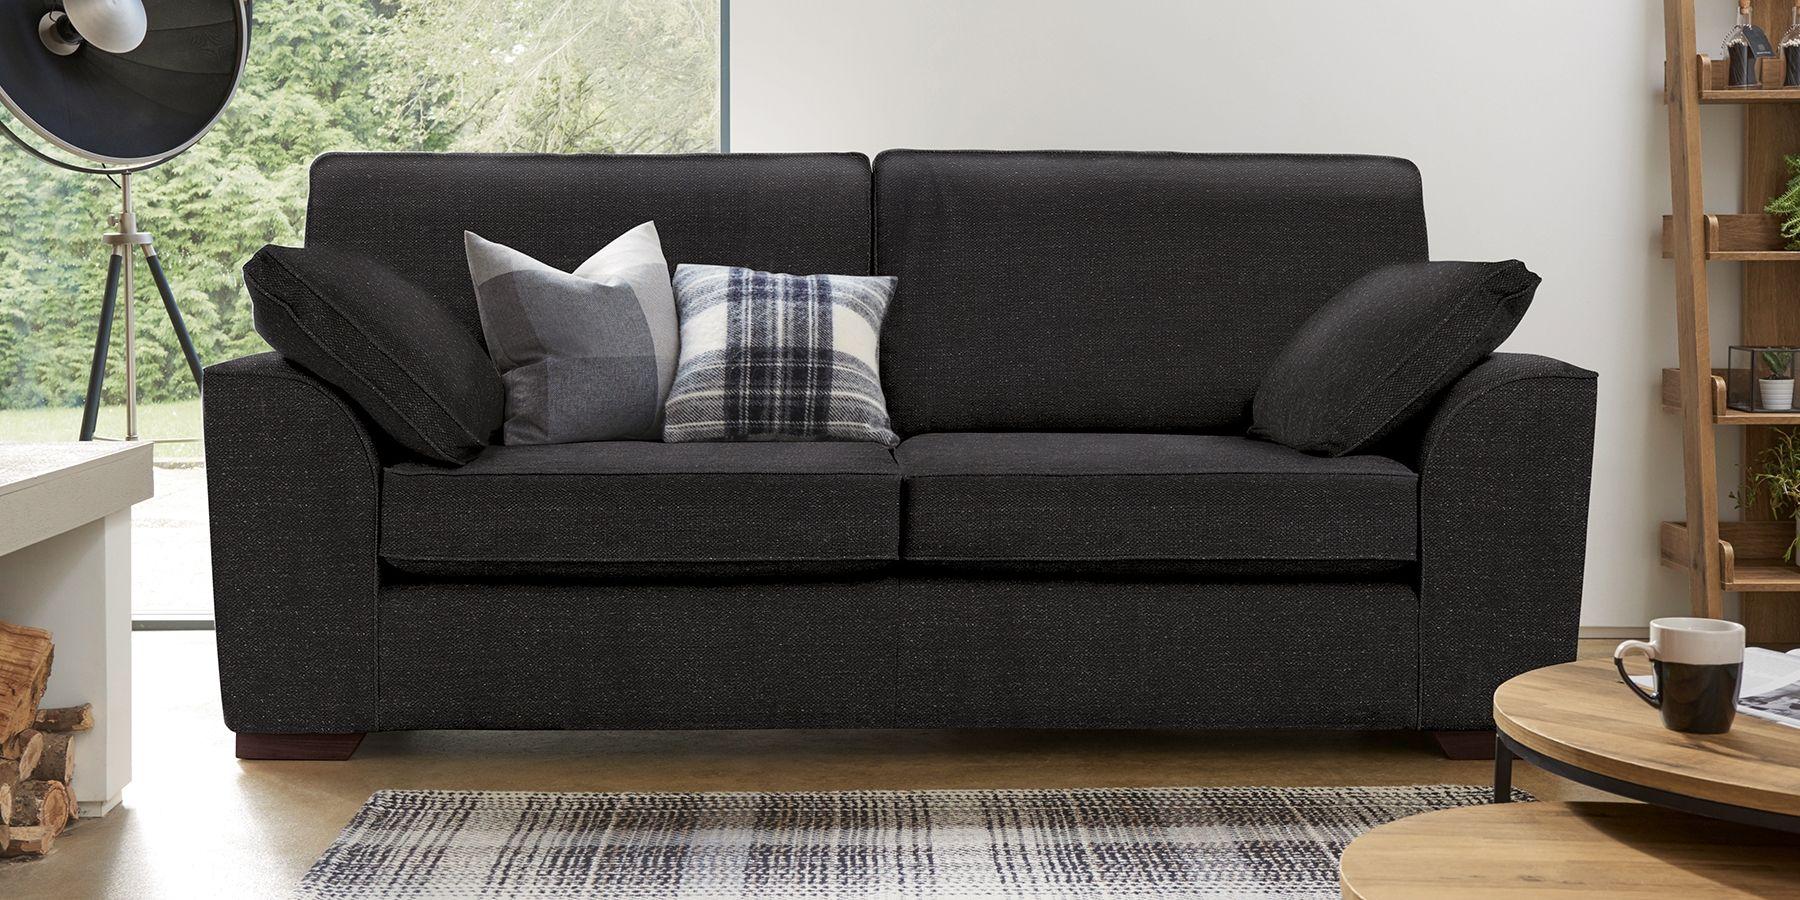 Buy Stamford Large Sofa 3 Seats Antique Velvet Dark Charcoal Large Square Angle Light From The Next Uk Online Shop Sofa Next Large Sofa Sofa